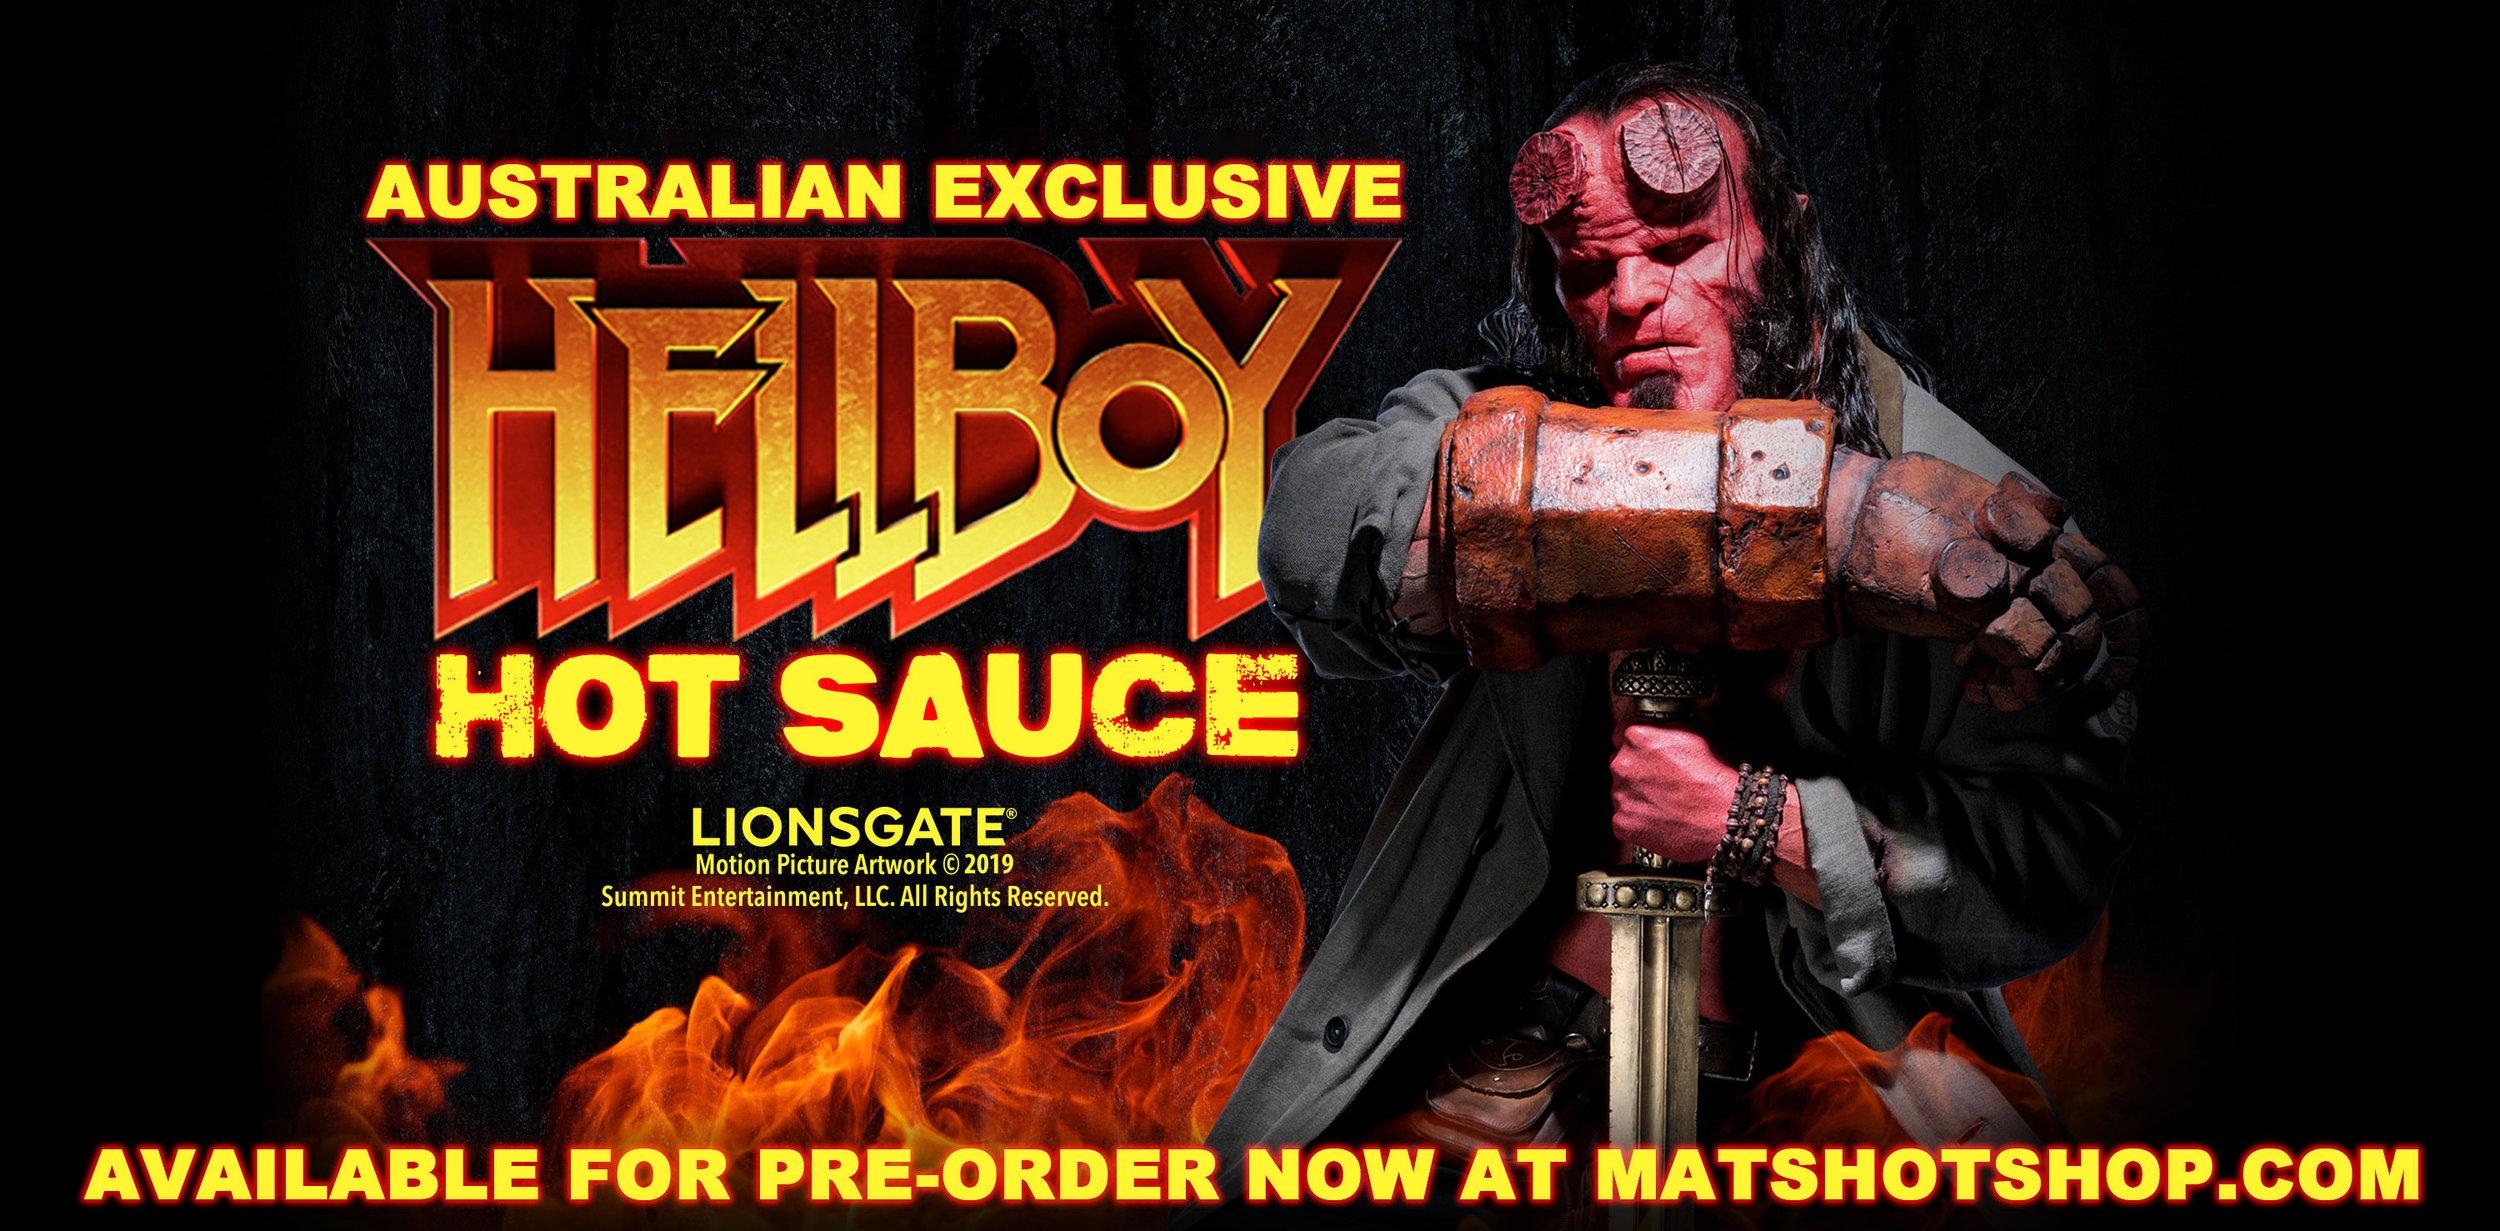 hellboy-banner-web2.jpg